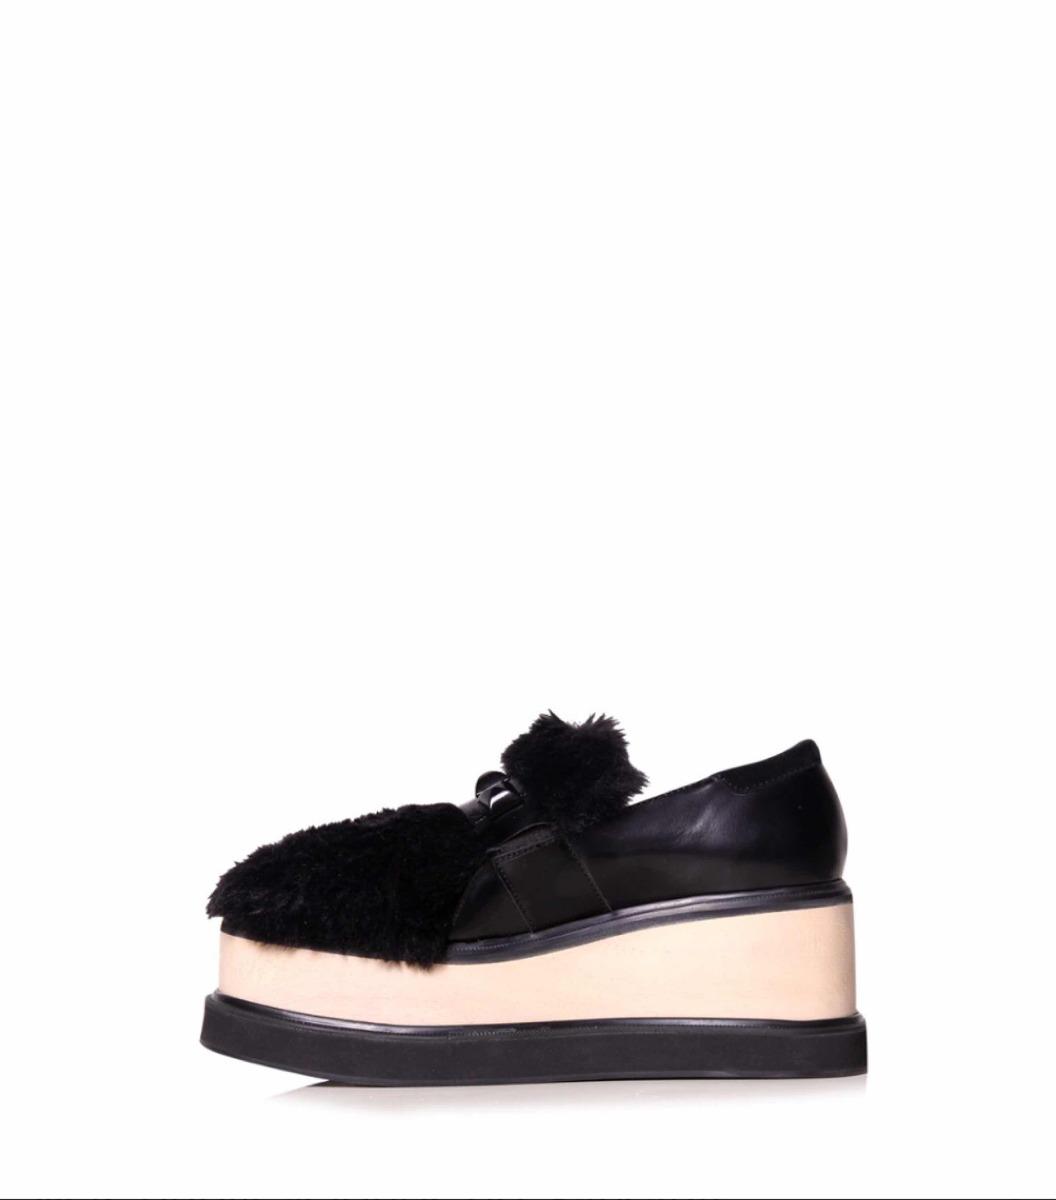 Zapatos Ricky Sarkany Zuecos Vinci (moda 3c7eb5d42d0